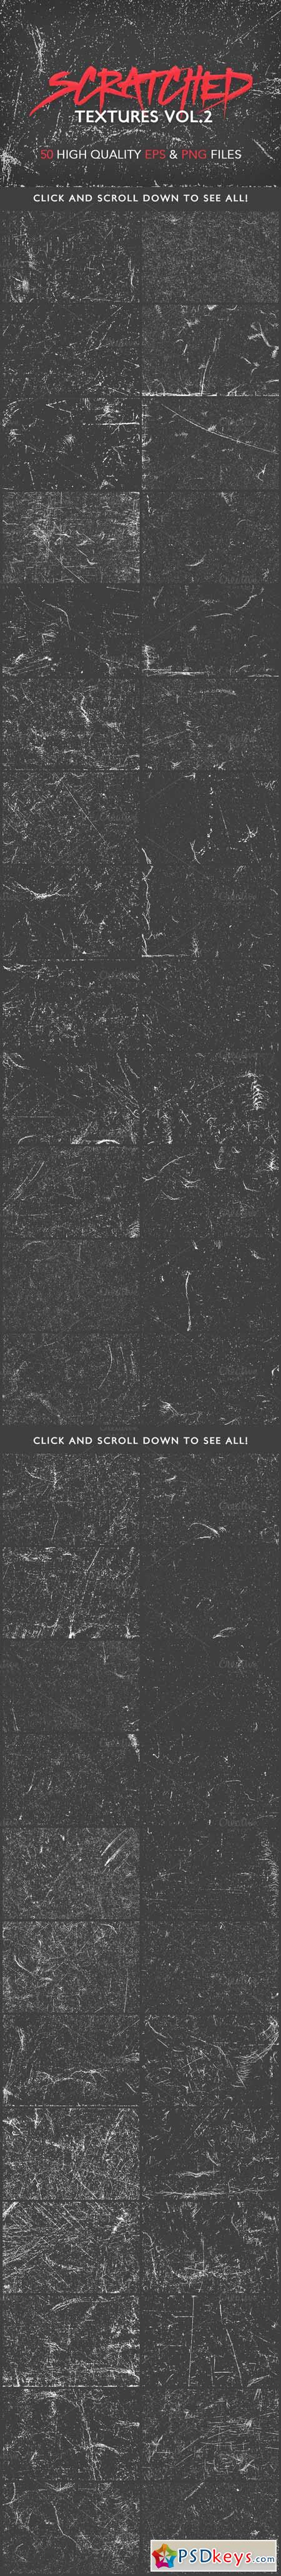 Scratched Textures Vol. 2 550297